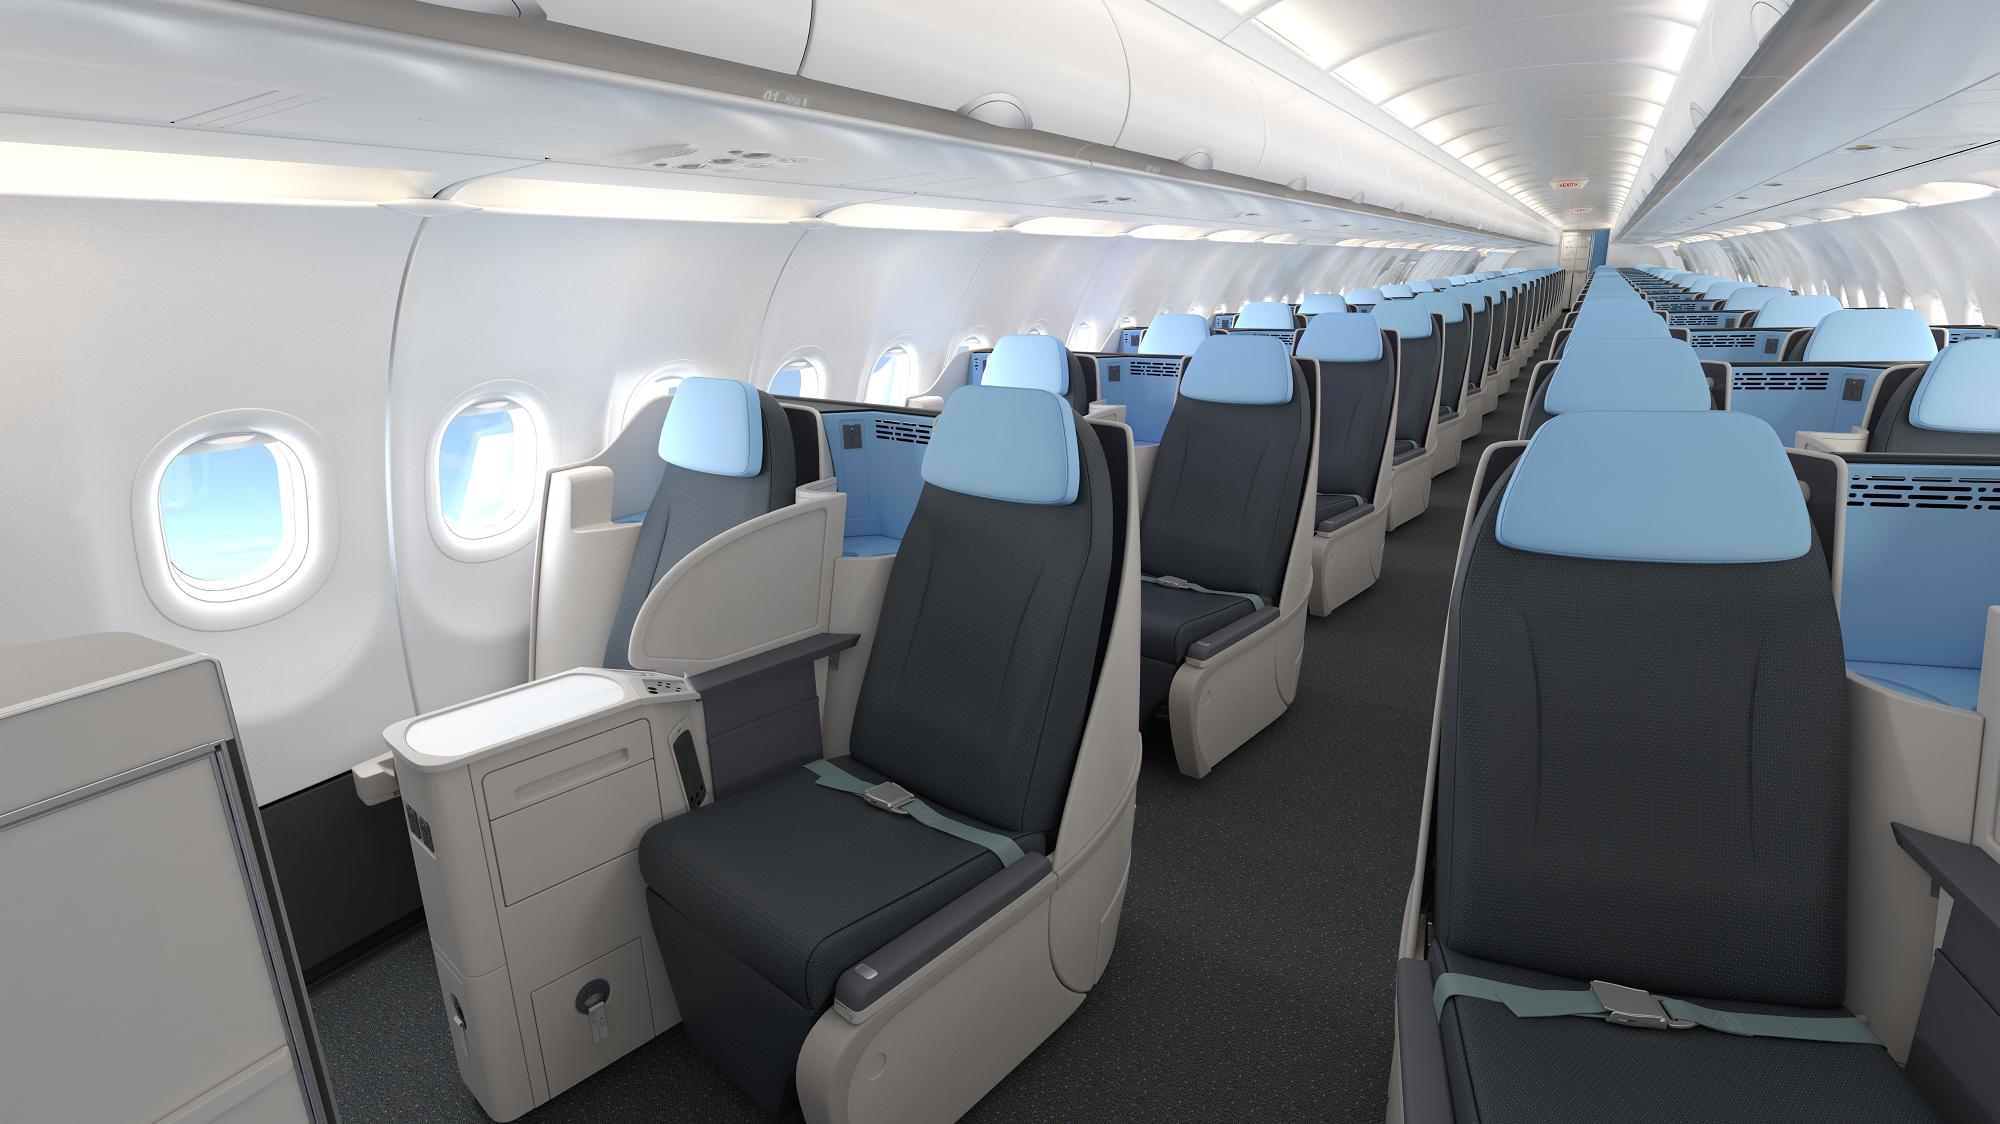 Cabine A321neo - Avant - petit